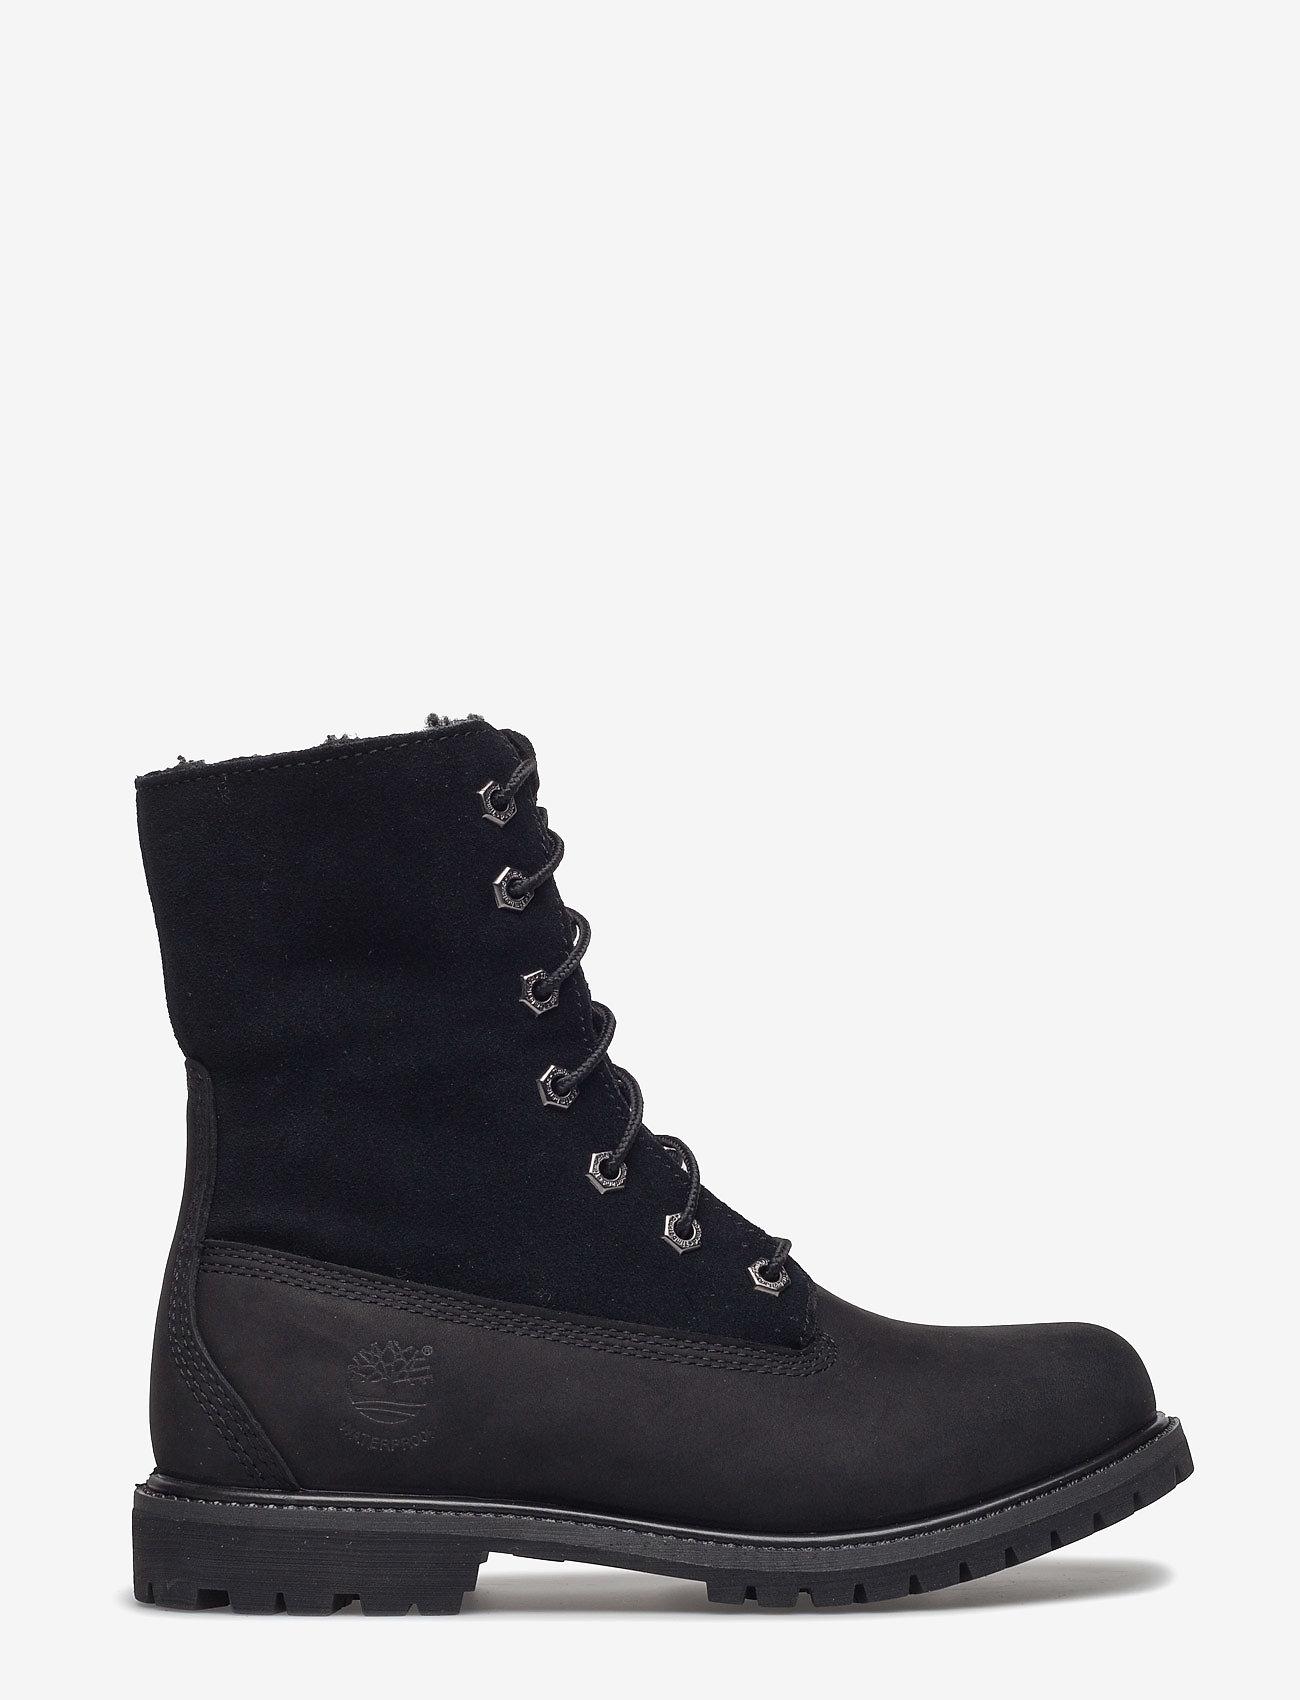 Timberland - Authentics Teddy Fleece WP Fold-Down - flade ankelstøvler - black - 0